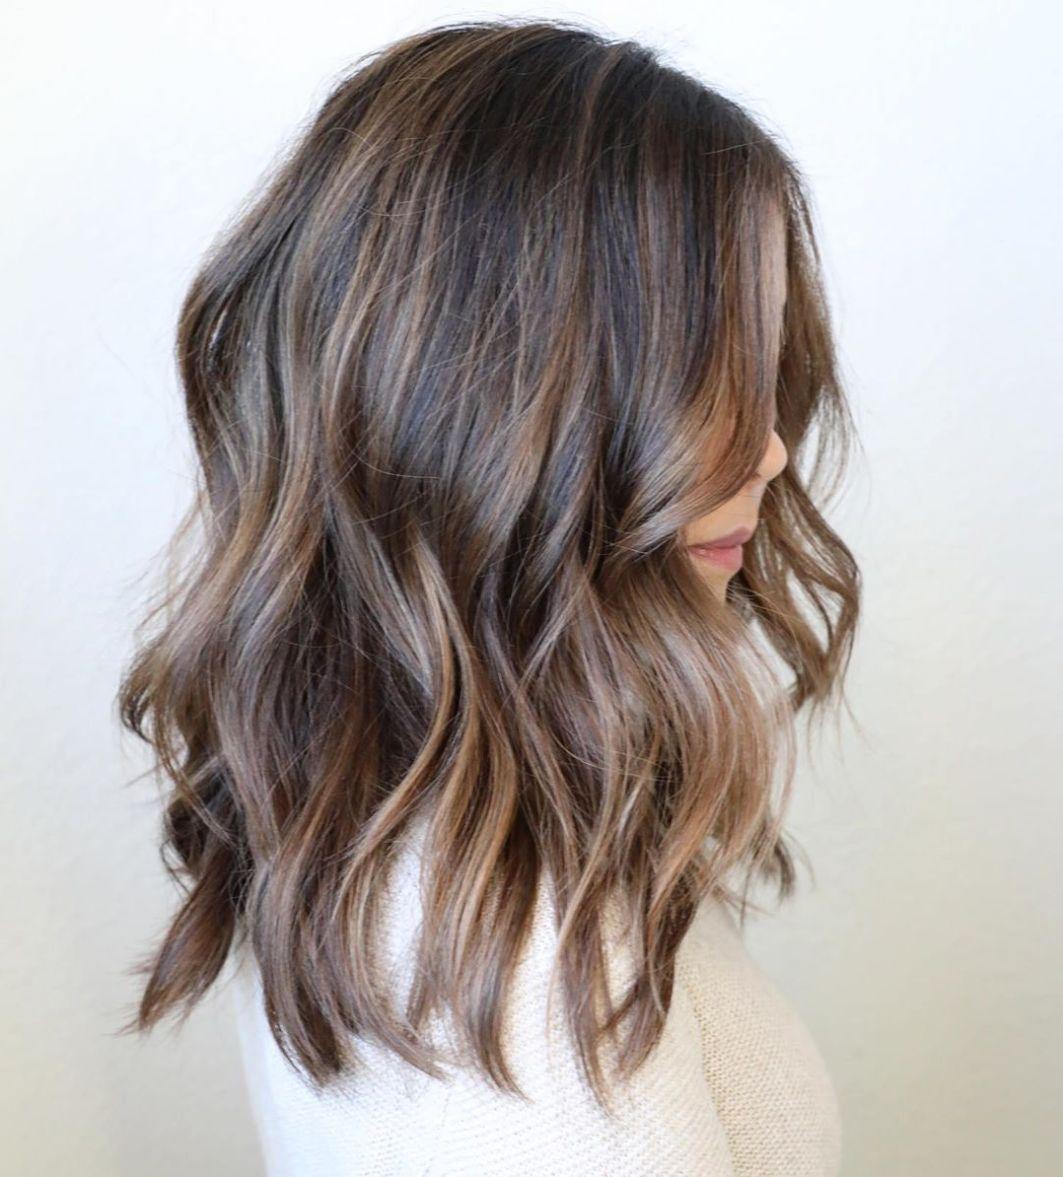 50 Trendy Brown Hair Colors And Brunette Hairstyles For 2020 Hair Adviser In 2020 Natural Brown Hair Dark Hair With Highlights Honey Brown Hair